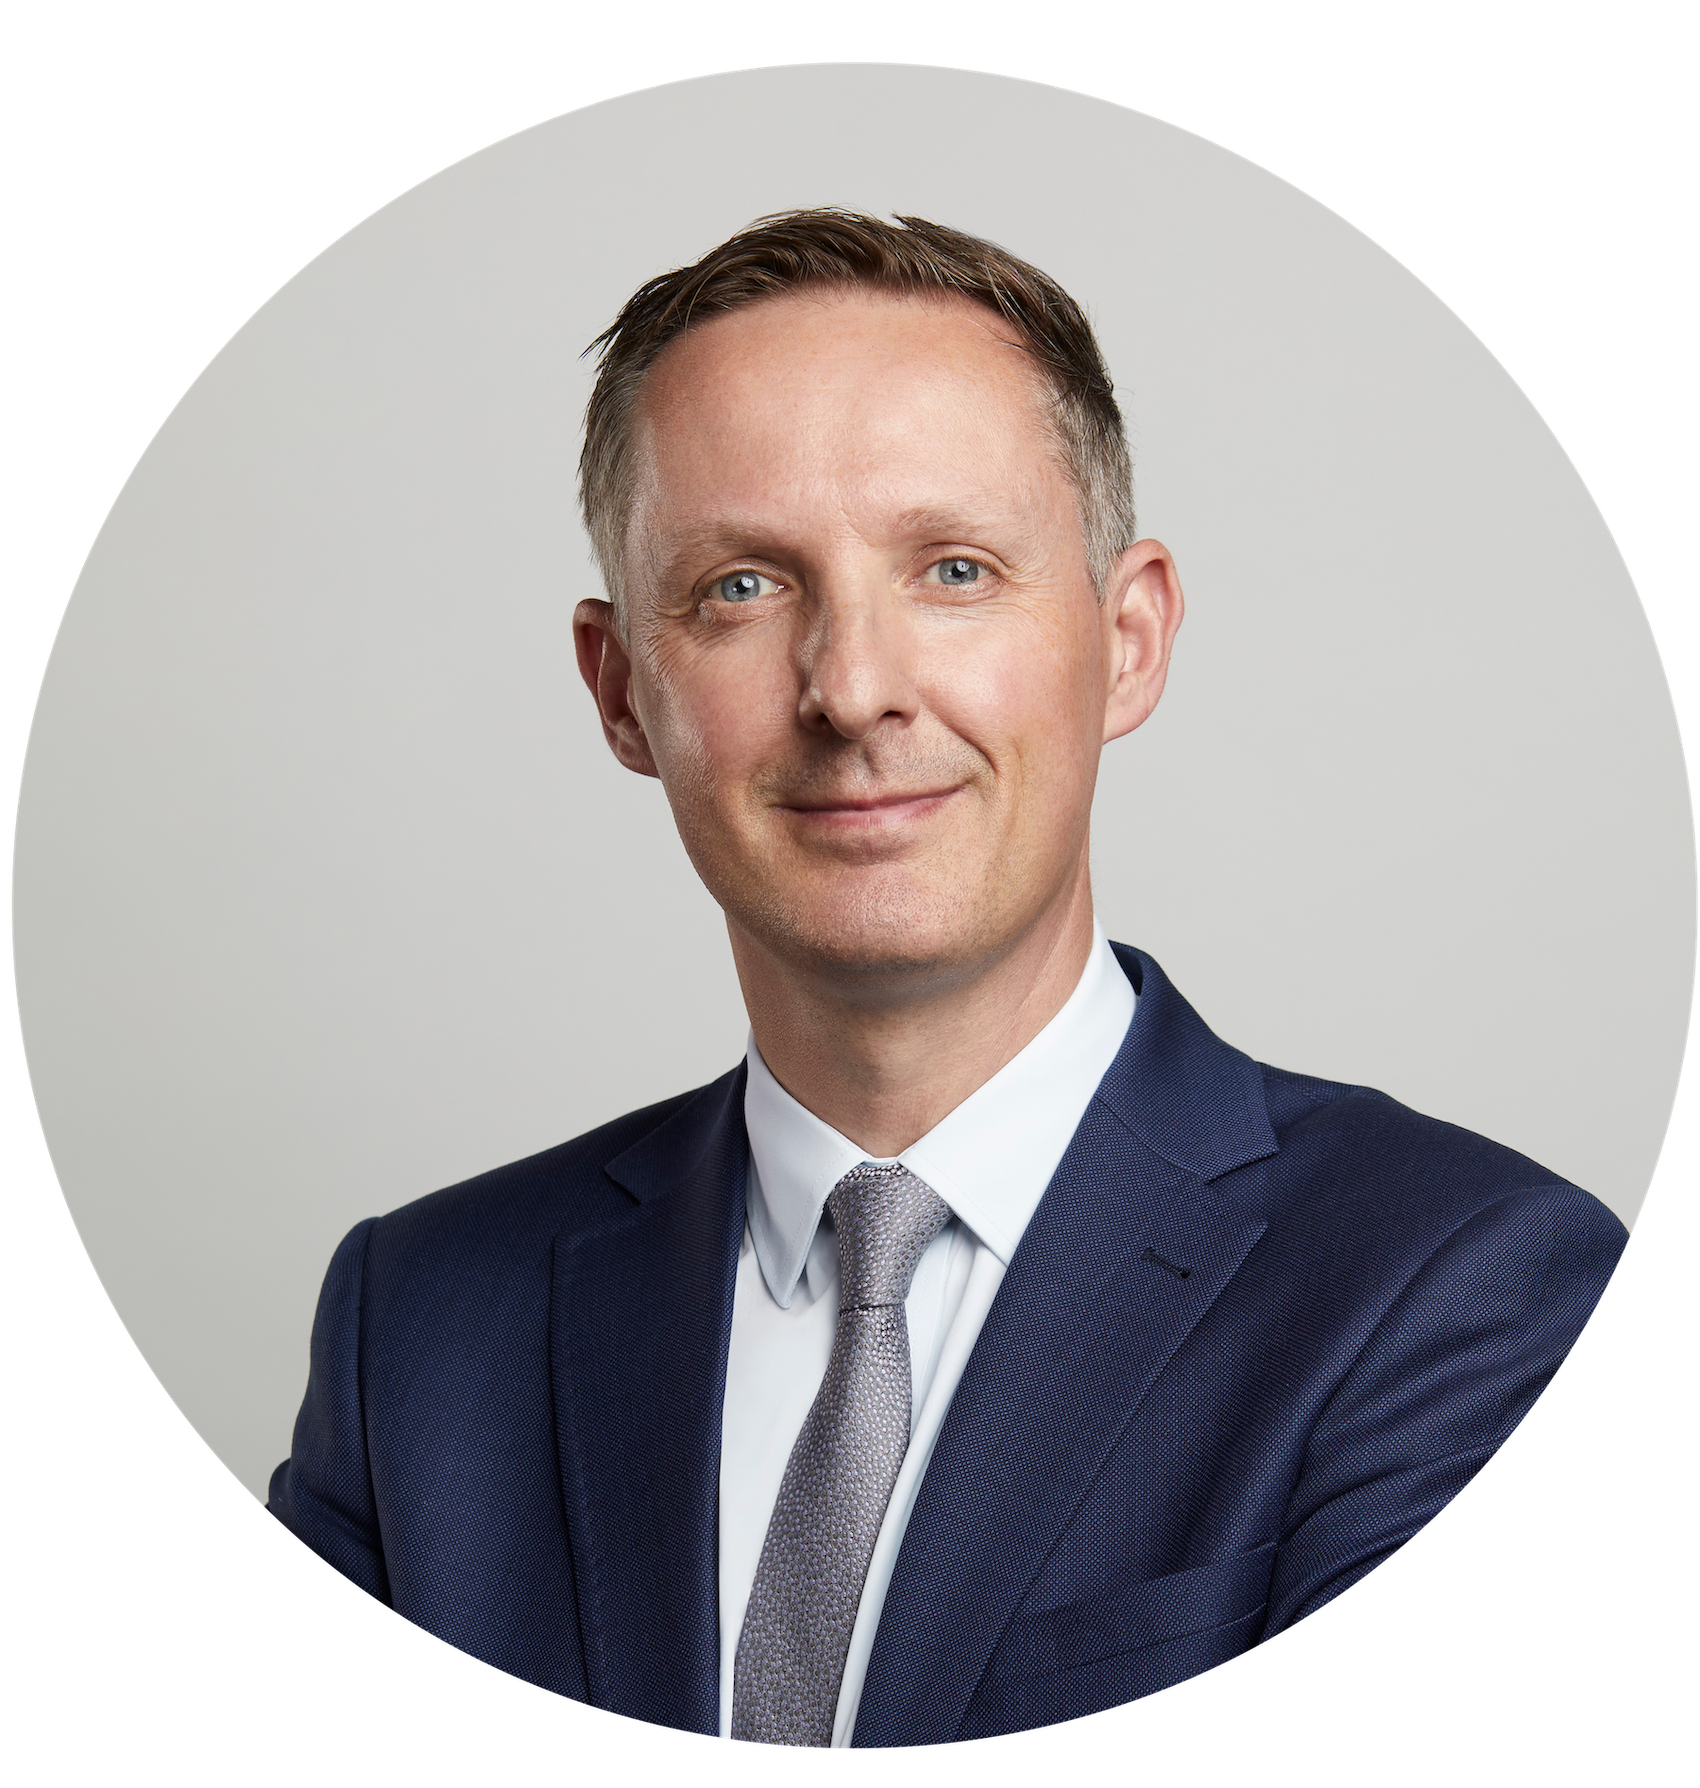 Dr Peter Finigan, Vascular Specialist & GP, part of UK Vein Clinic varicose vein service leadership team